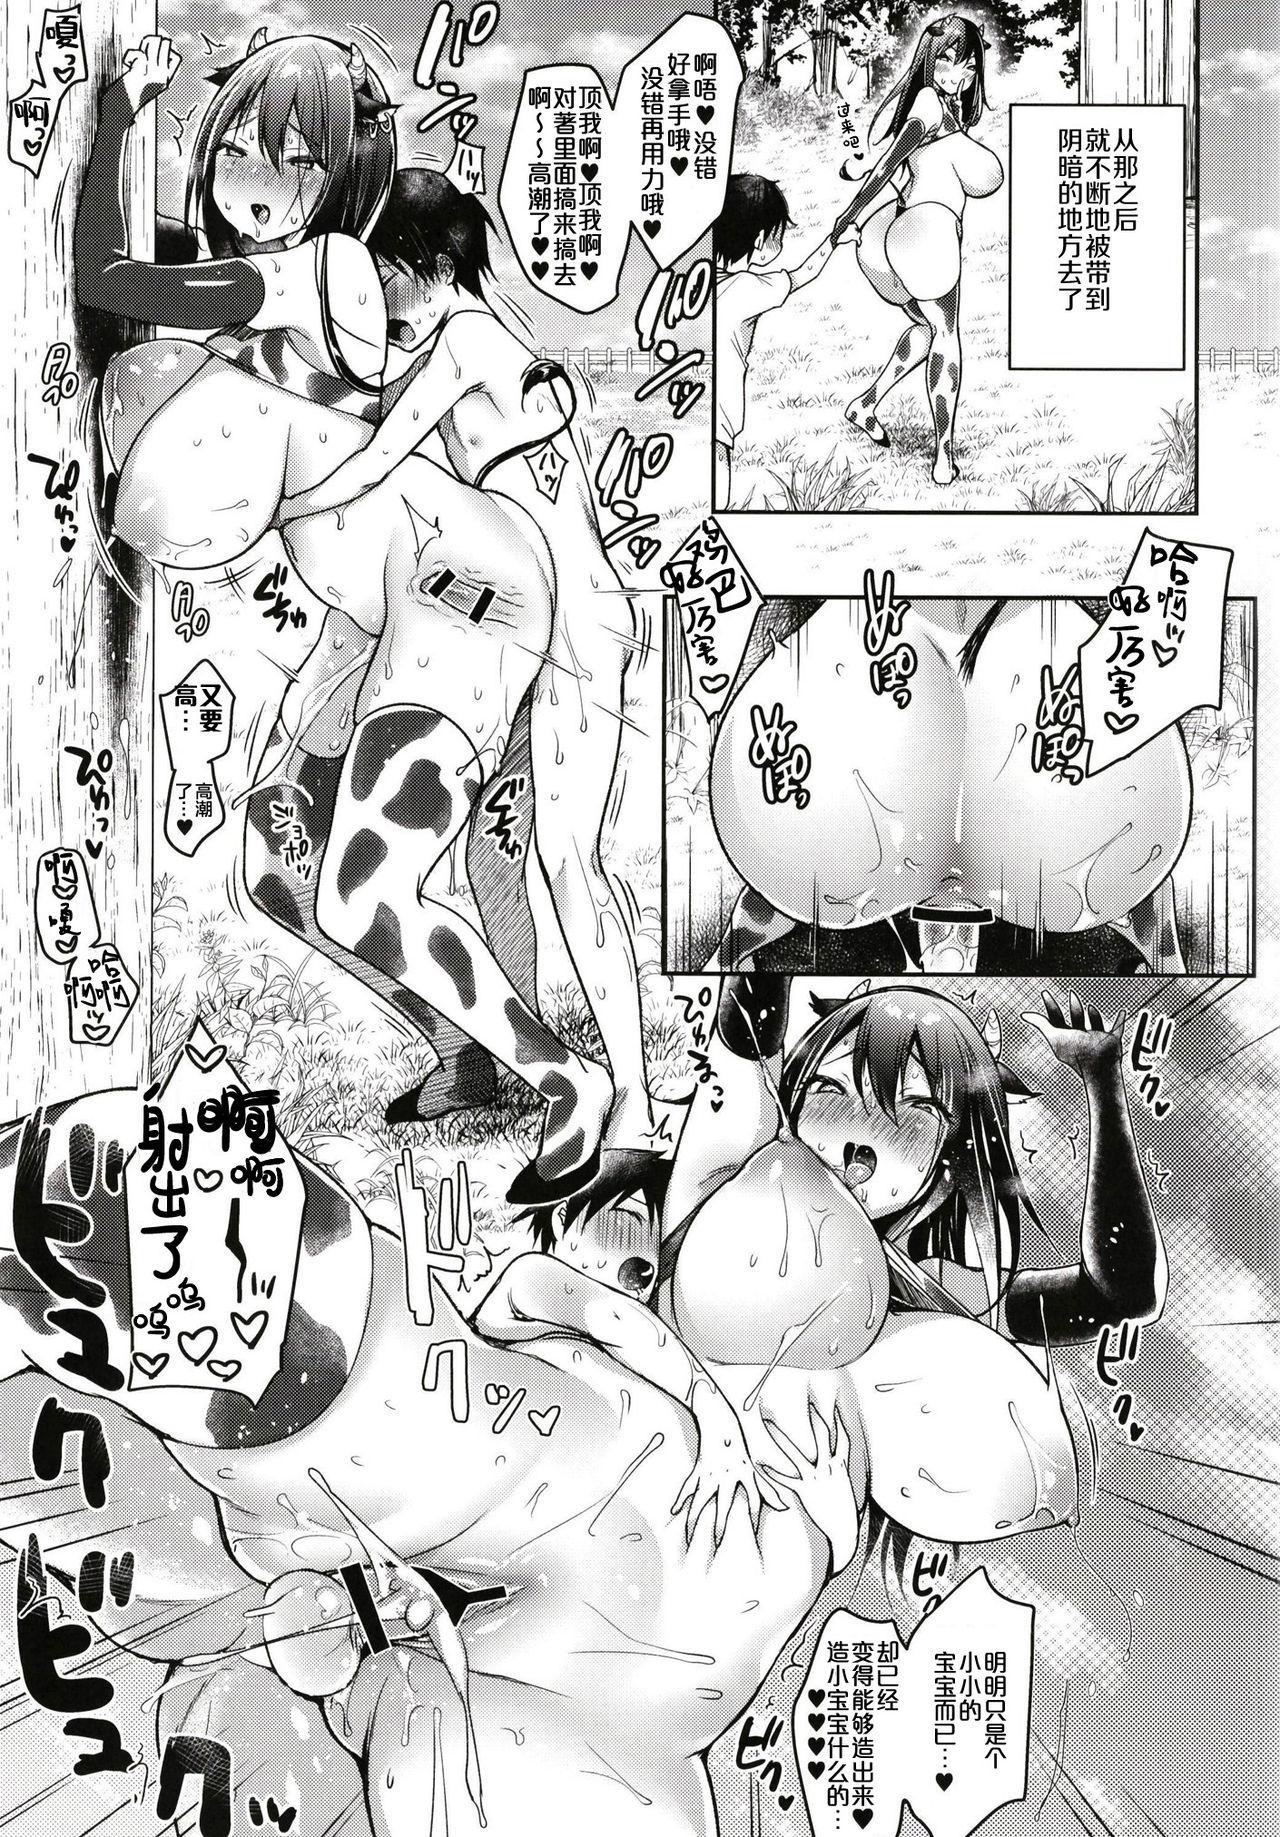 Makiba no Bonyuu Nikki 4 8